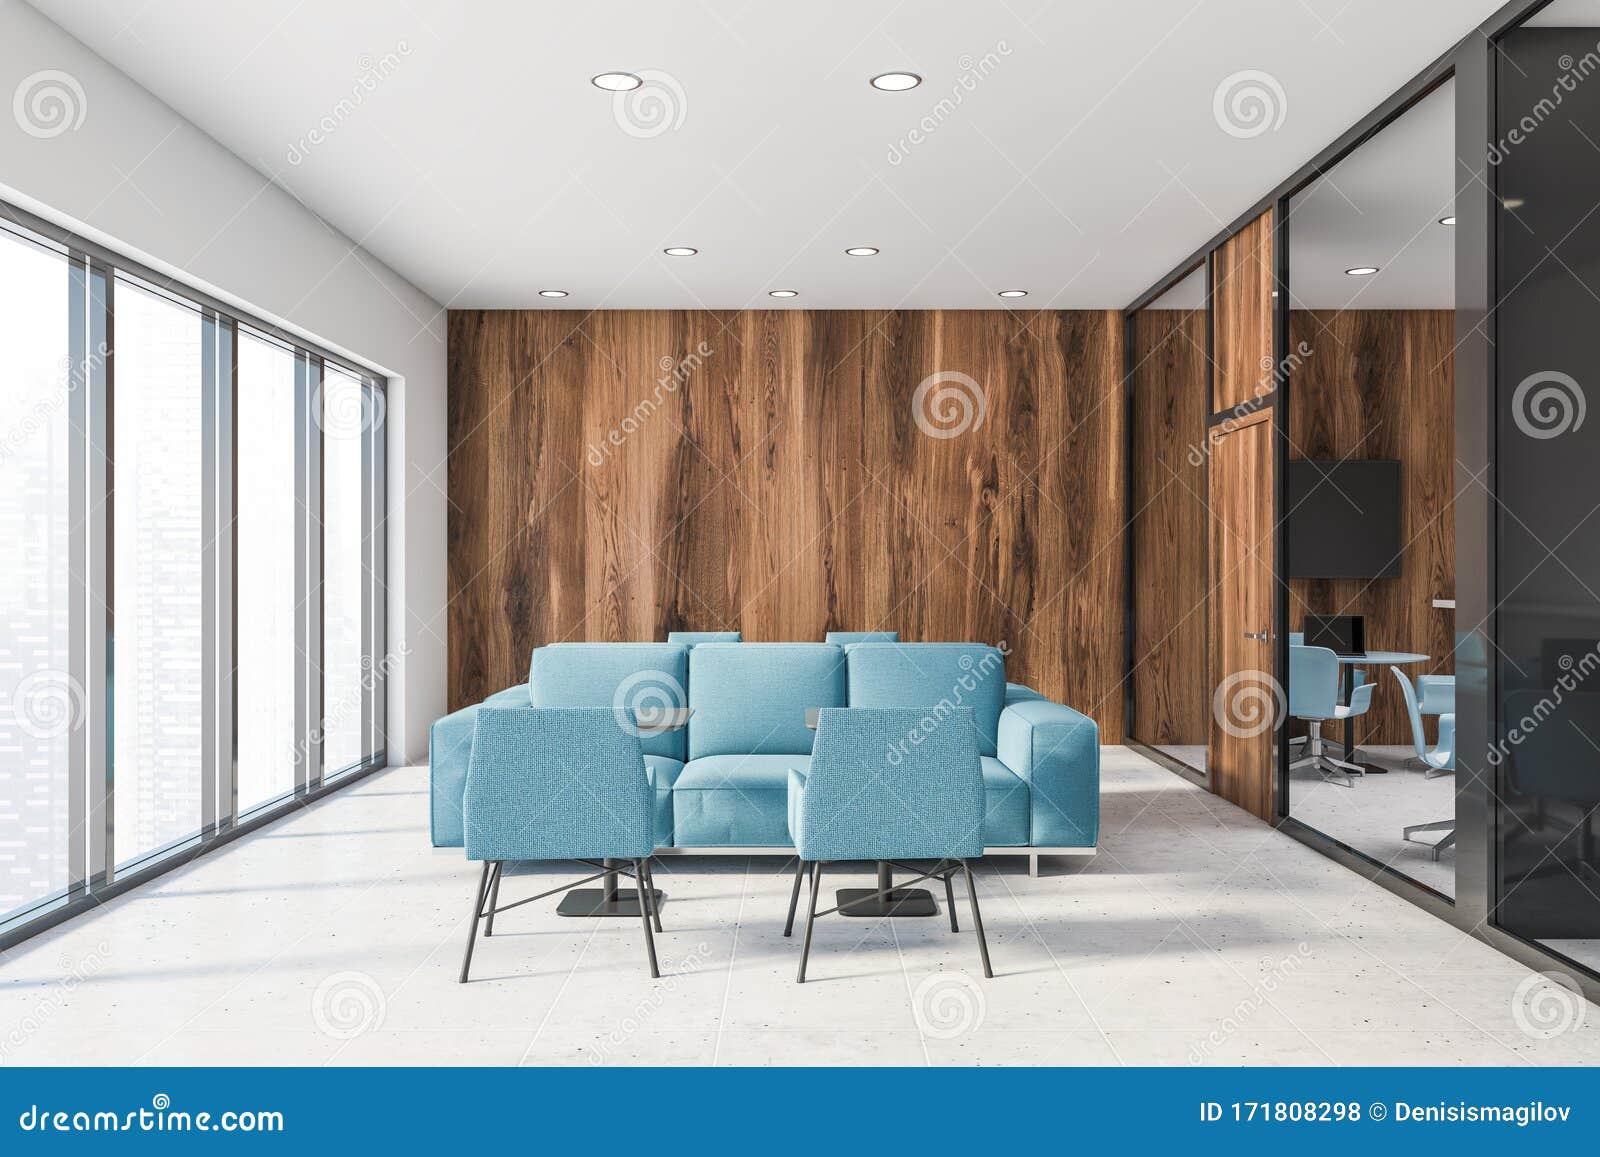 White And Wooden Office Lounge Blue Sofas Stock Illustration Illustration Of Lounge Horizontal 171808298